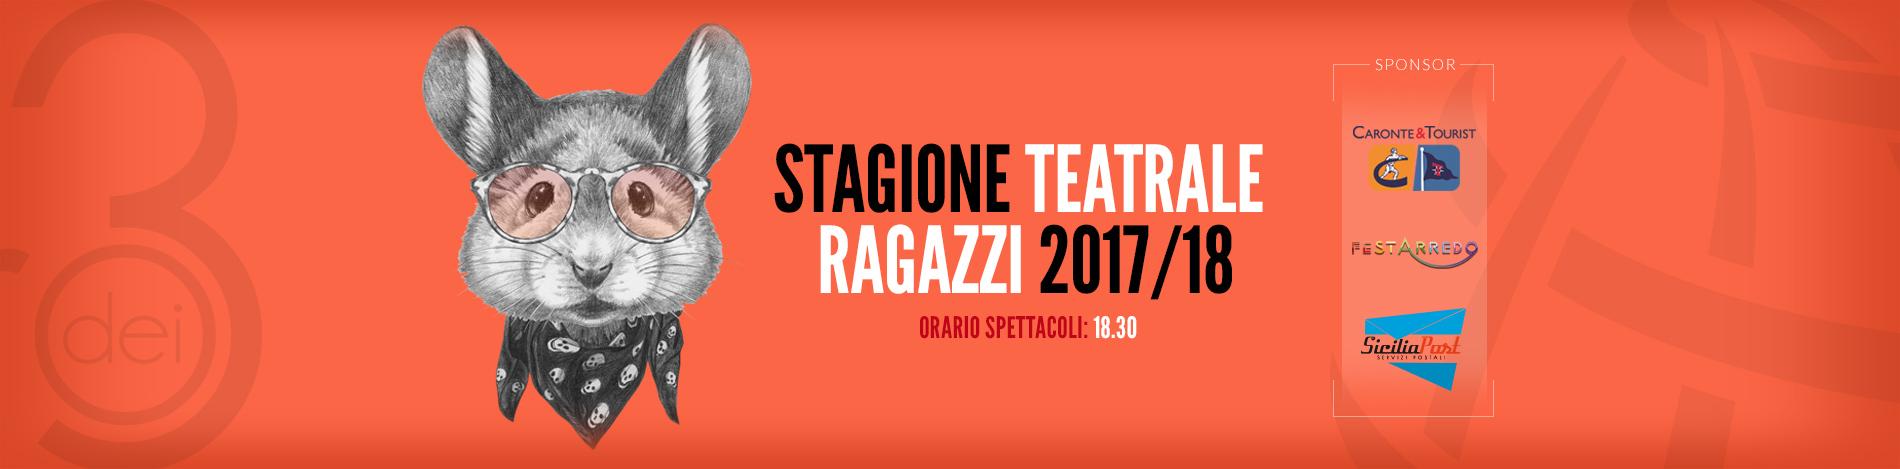 slide-sito-web-Stagione-Teatrale-Ragazzisponsor